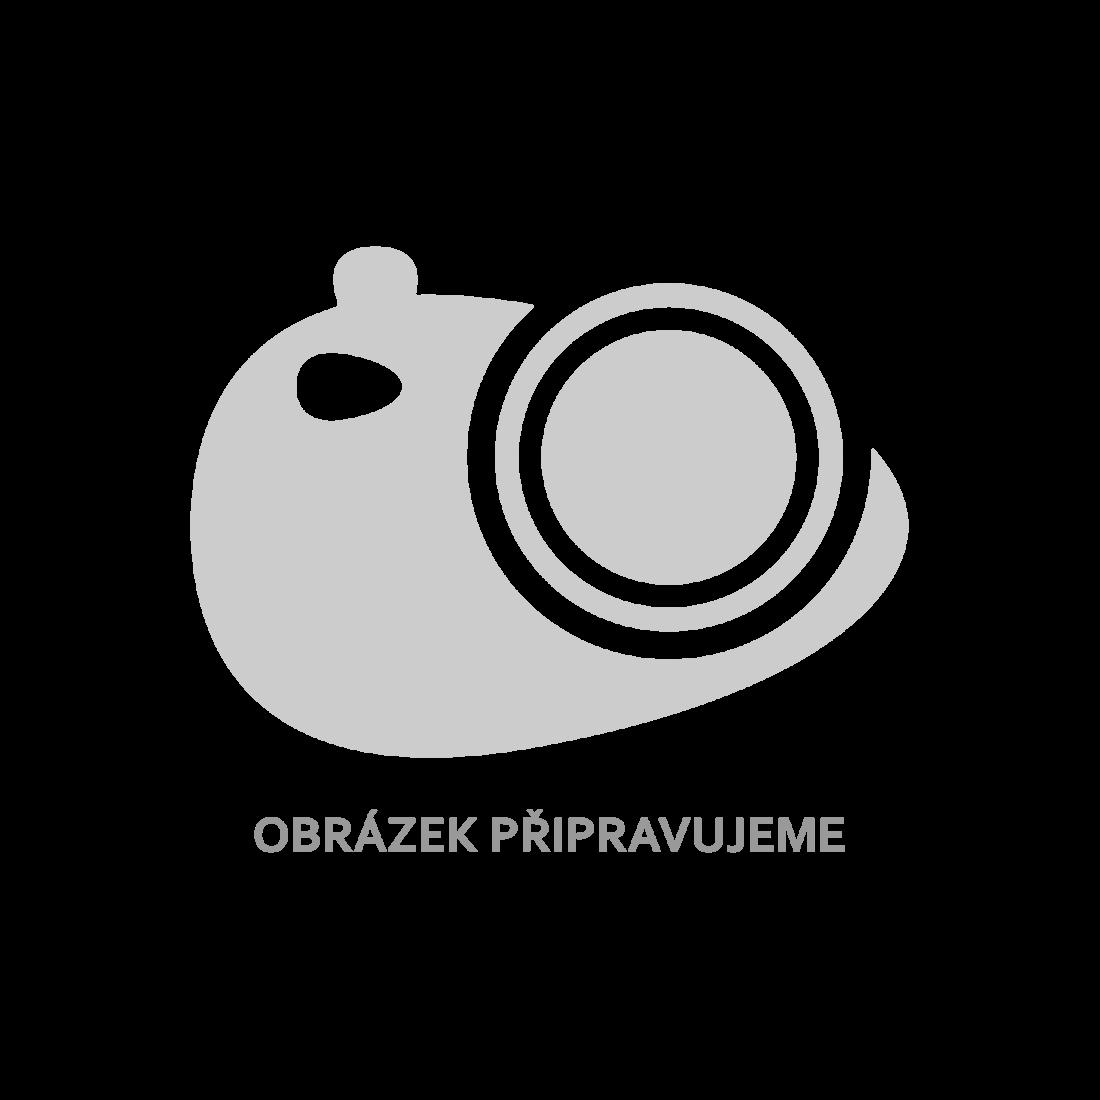 Moskytiéra nad postel 2 ks - hranatá - 220 x 200 x 210 cm - bílá